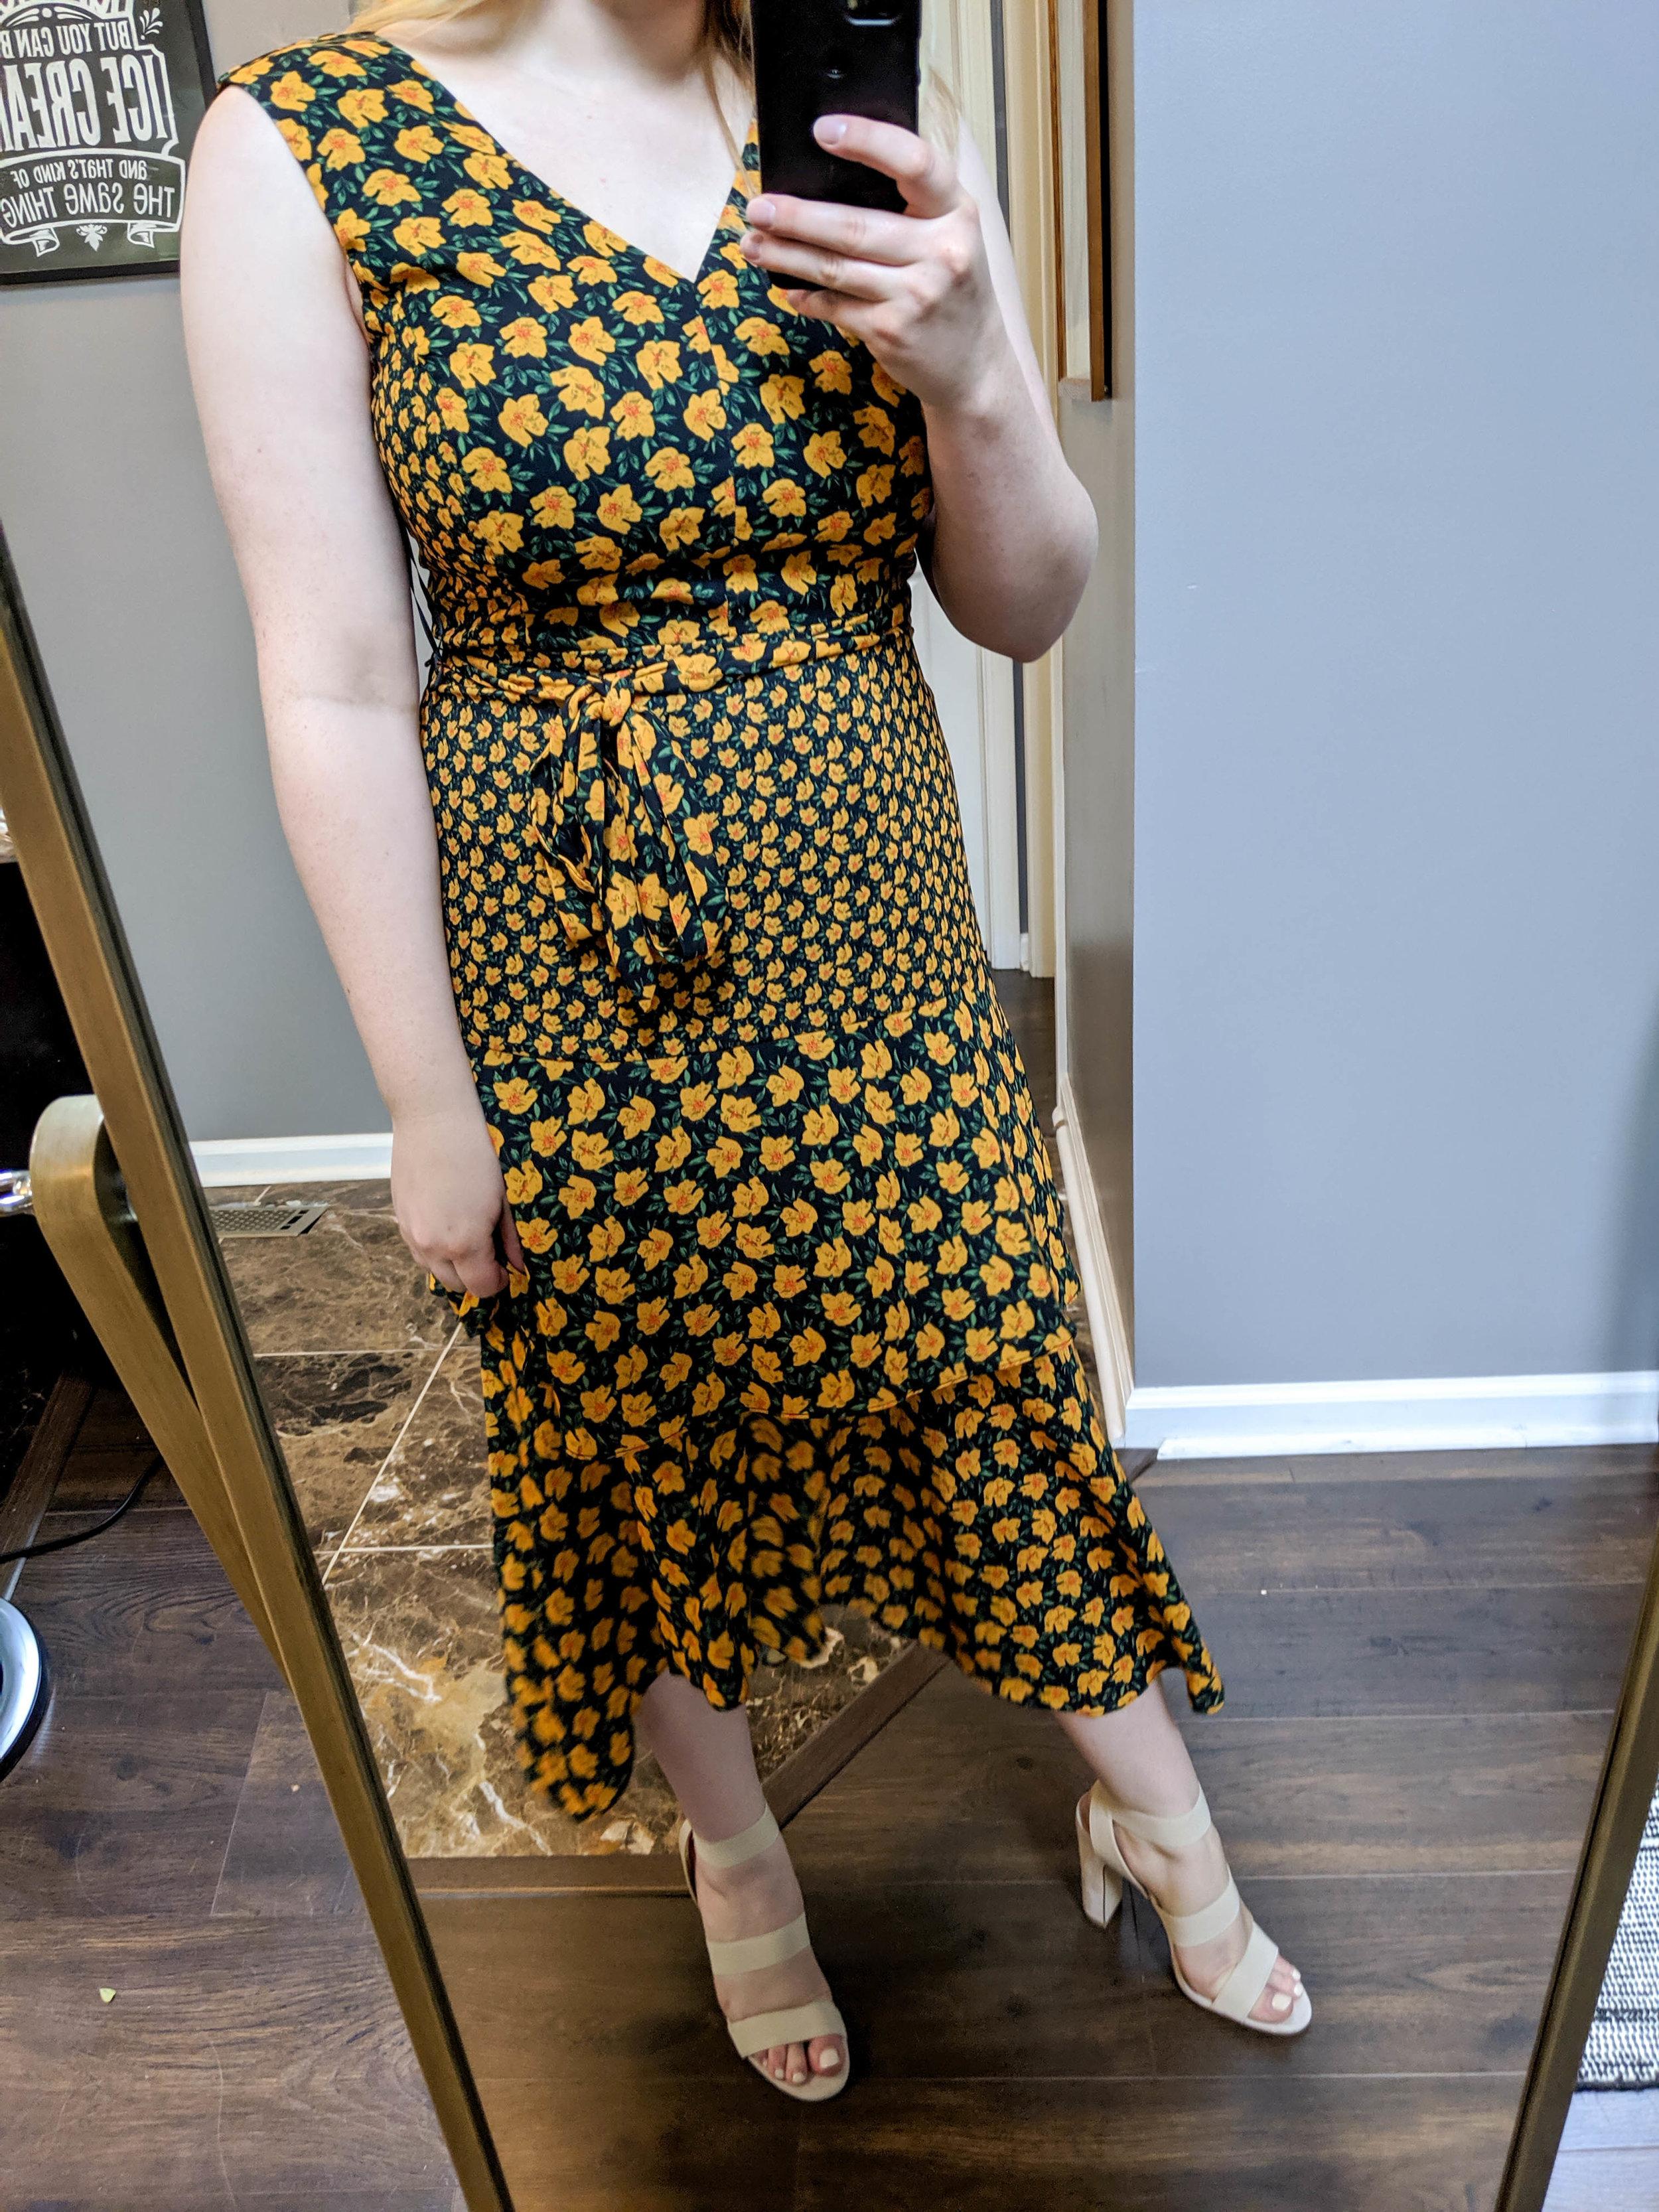 Maggie a la Mode 2019 Nordstrom Anniversary Sale Review Try On Real Body Sam Edelman Bold Poppy Tiered Asymmetrical Midi Dress, Steve Madden Tiffani Ankle Strap Sandal